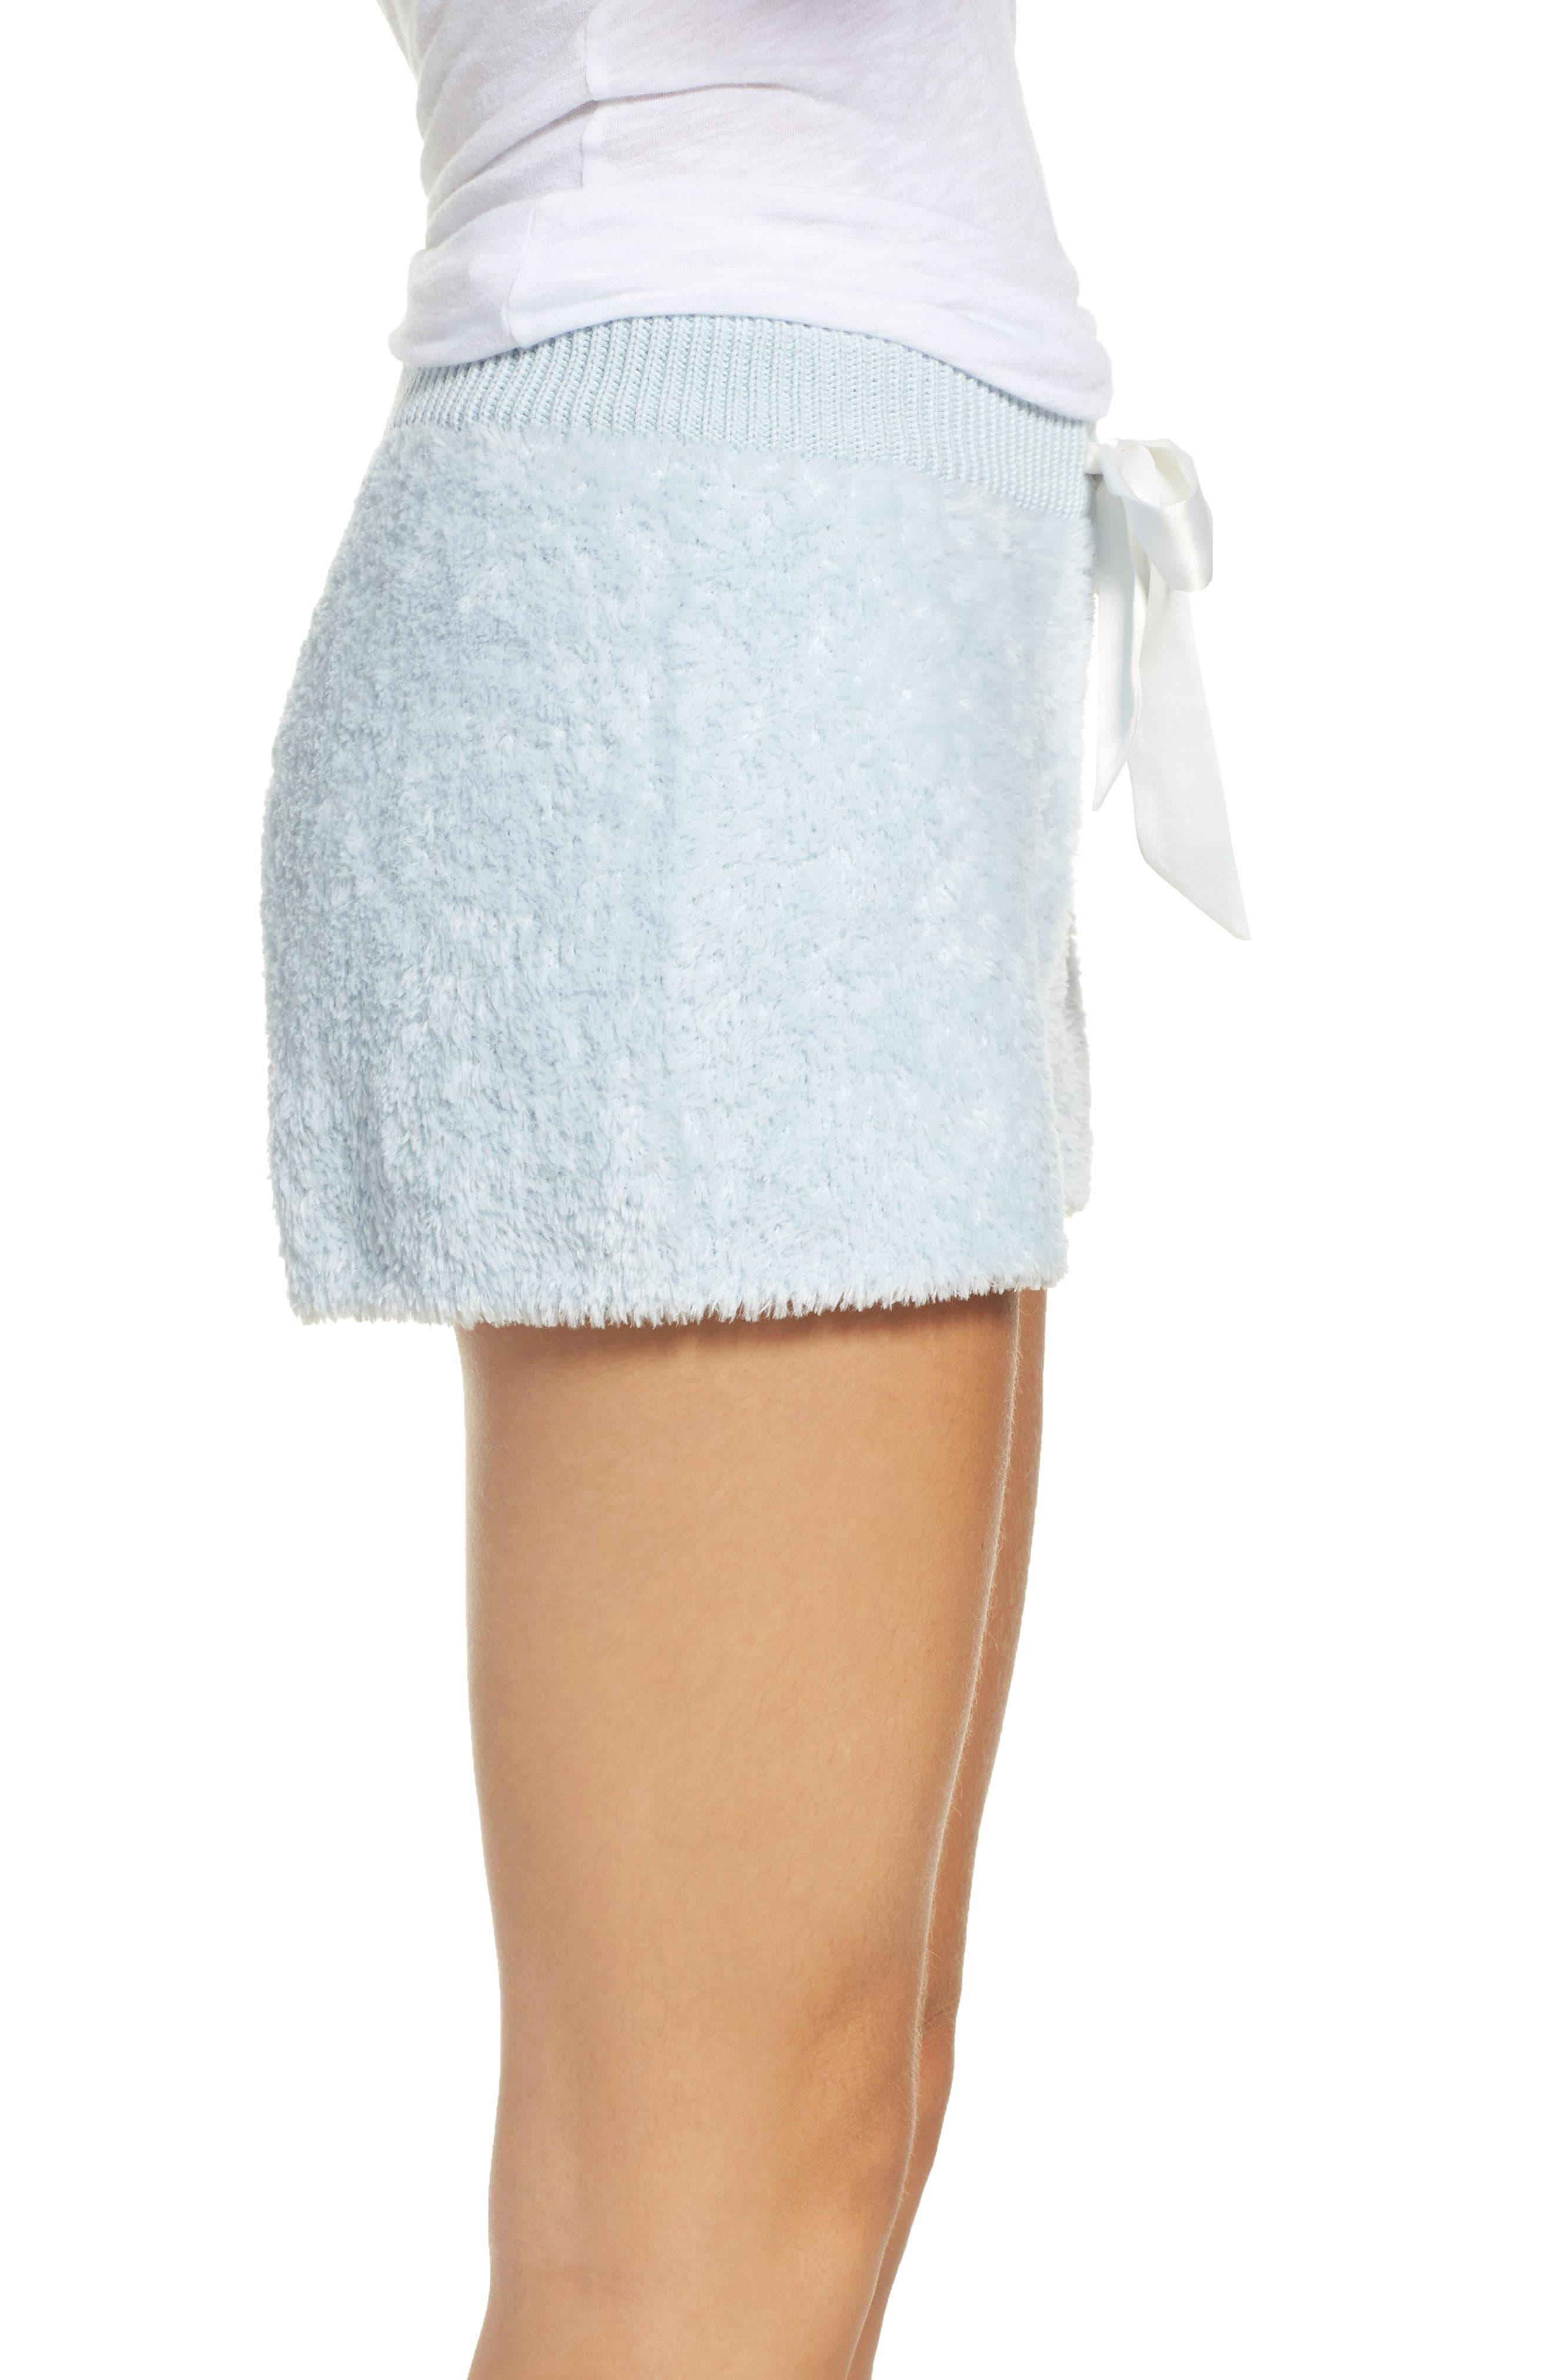 Fuzzy Lounge Shorts,                             Alternate thumbnail 3, color,                             Blue Drift